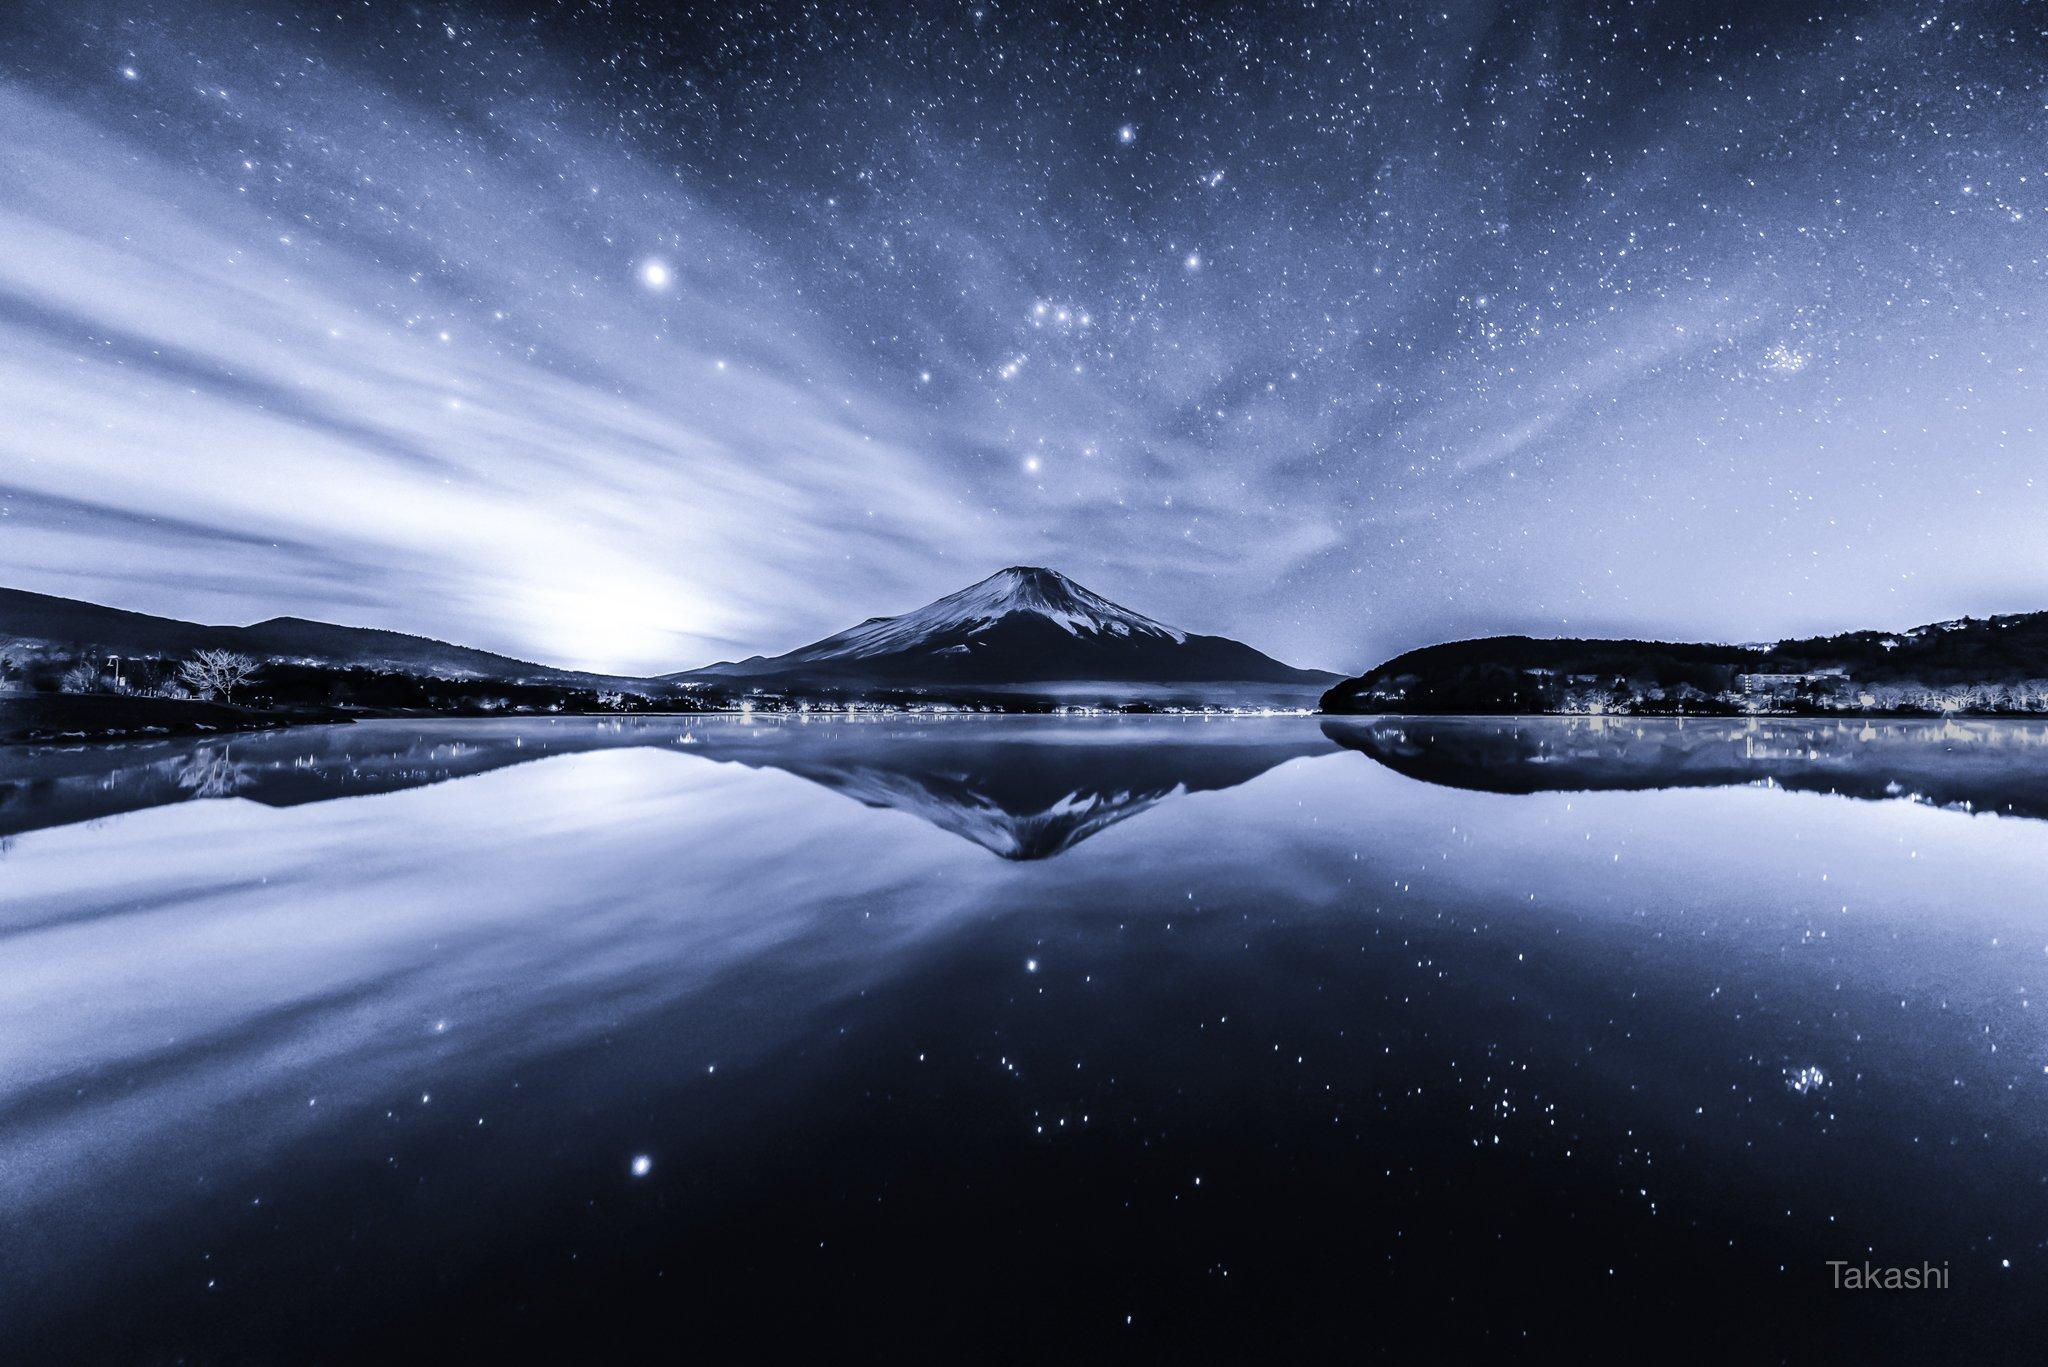 Fuji,mountain,Japan,cloud,lake,water,reflection,star,orion,beautiful,fantastic,amazing,bye,sky, Takashi